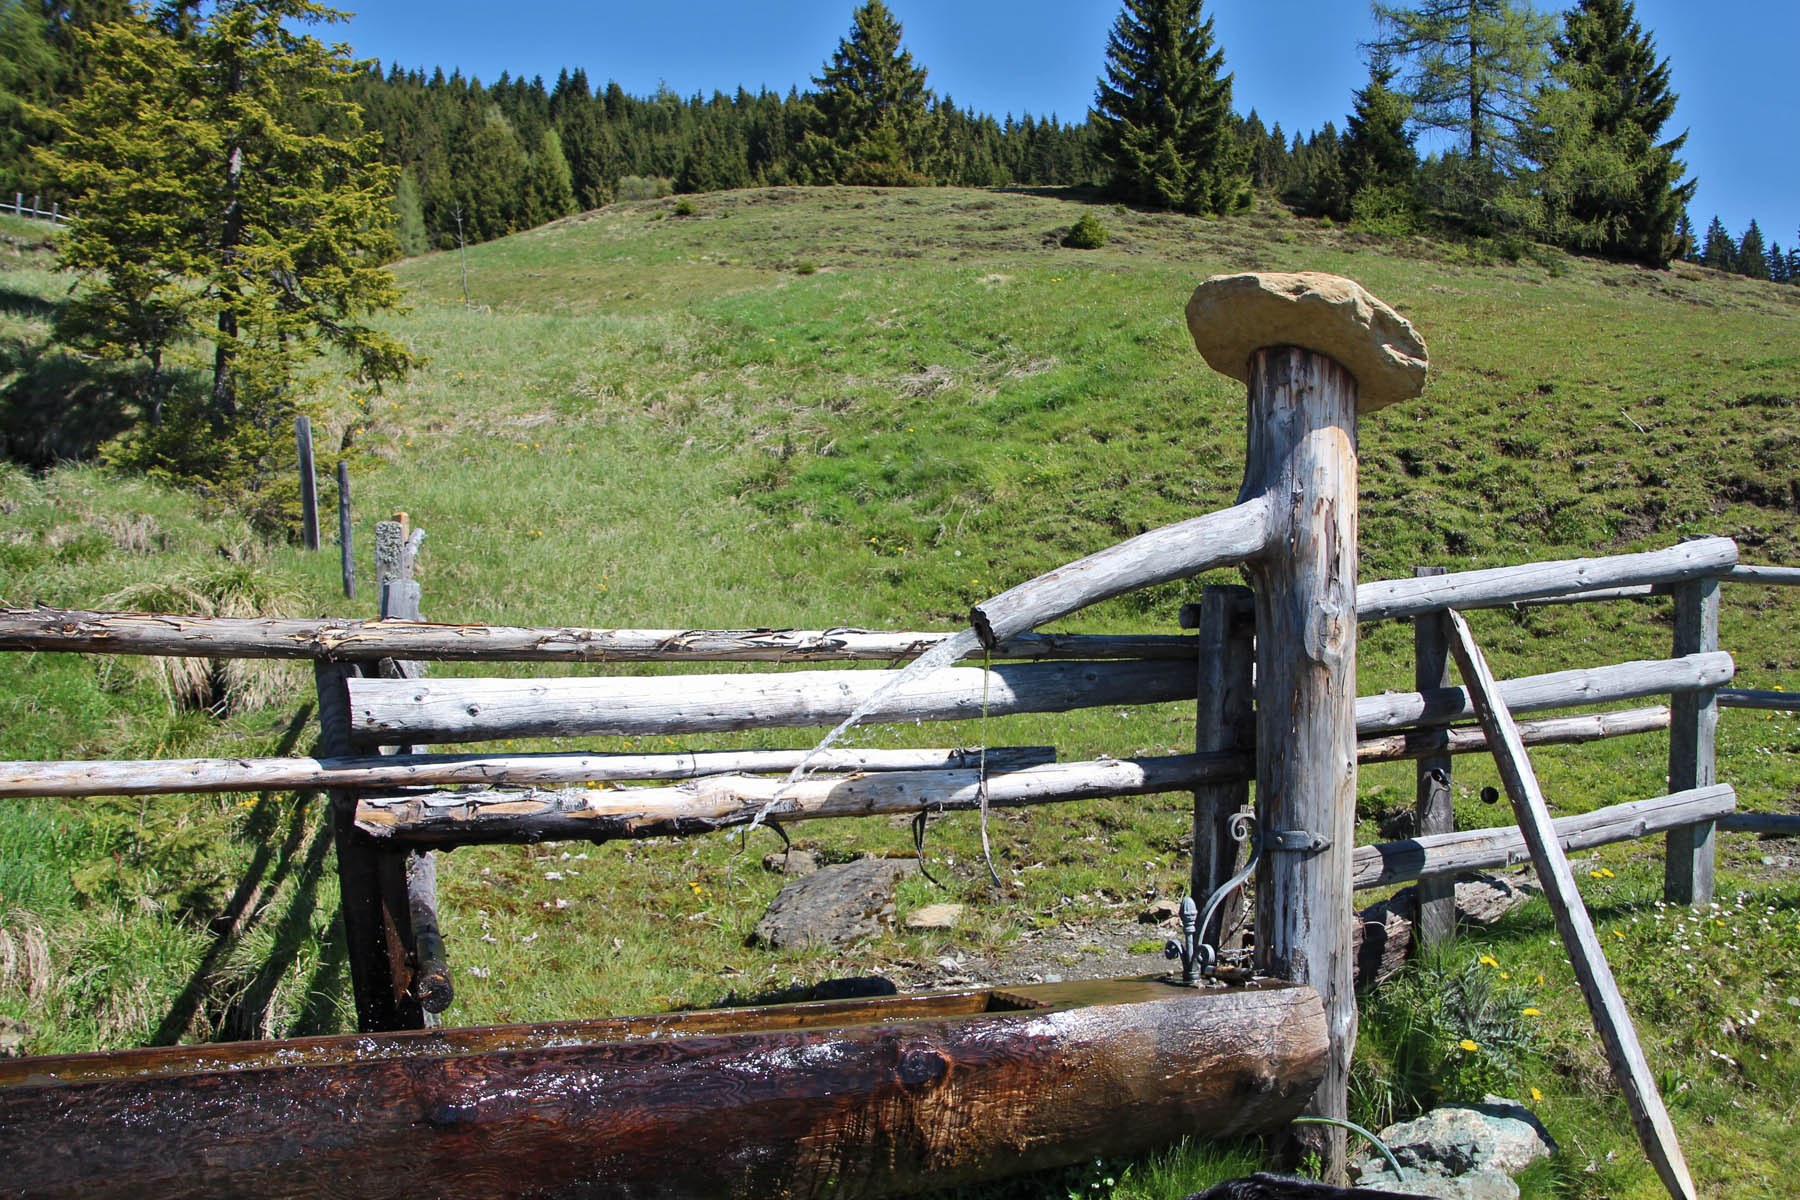 Brunnen am Wegesrand bieten Erfrischung für Wanderer